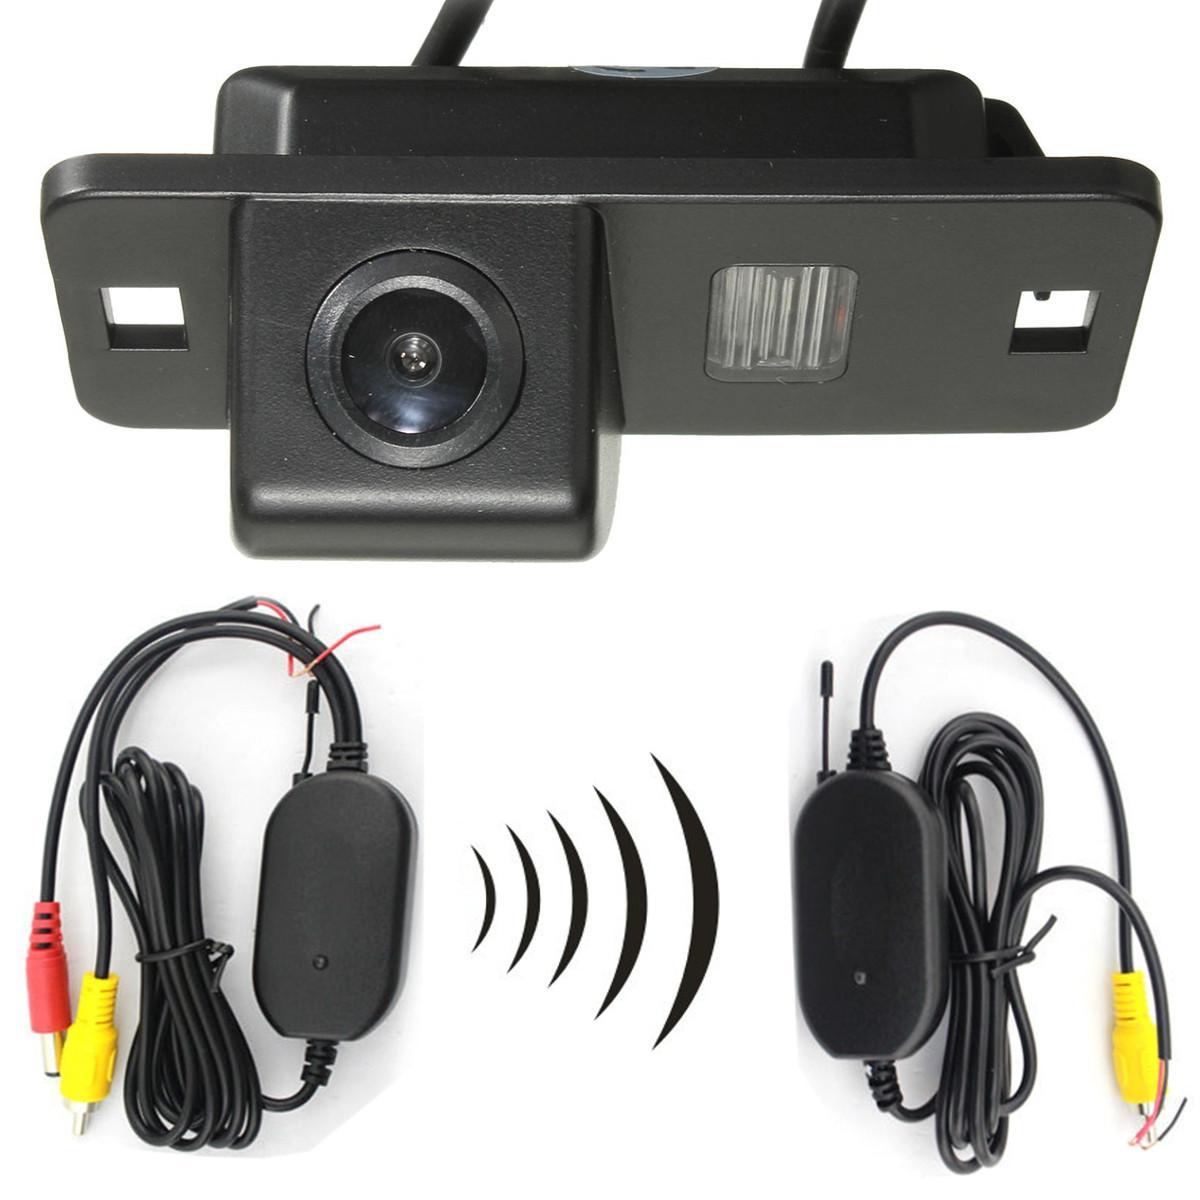 2015 New Wireless Reverse Rear view Camera CCD For BMW 1/3/5 Serie X5 X6 E39 E46 E53 E90(China (Mainland))